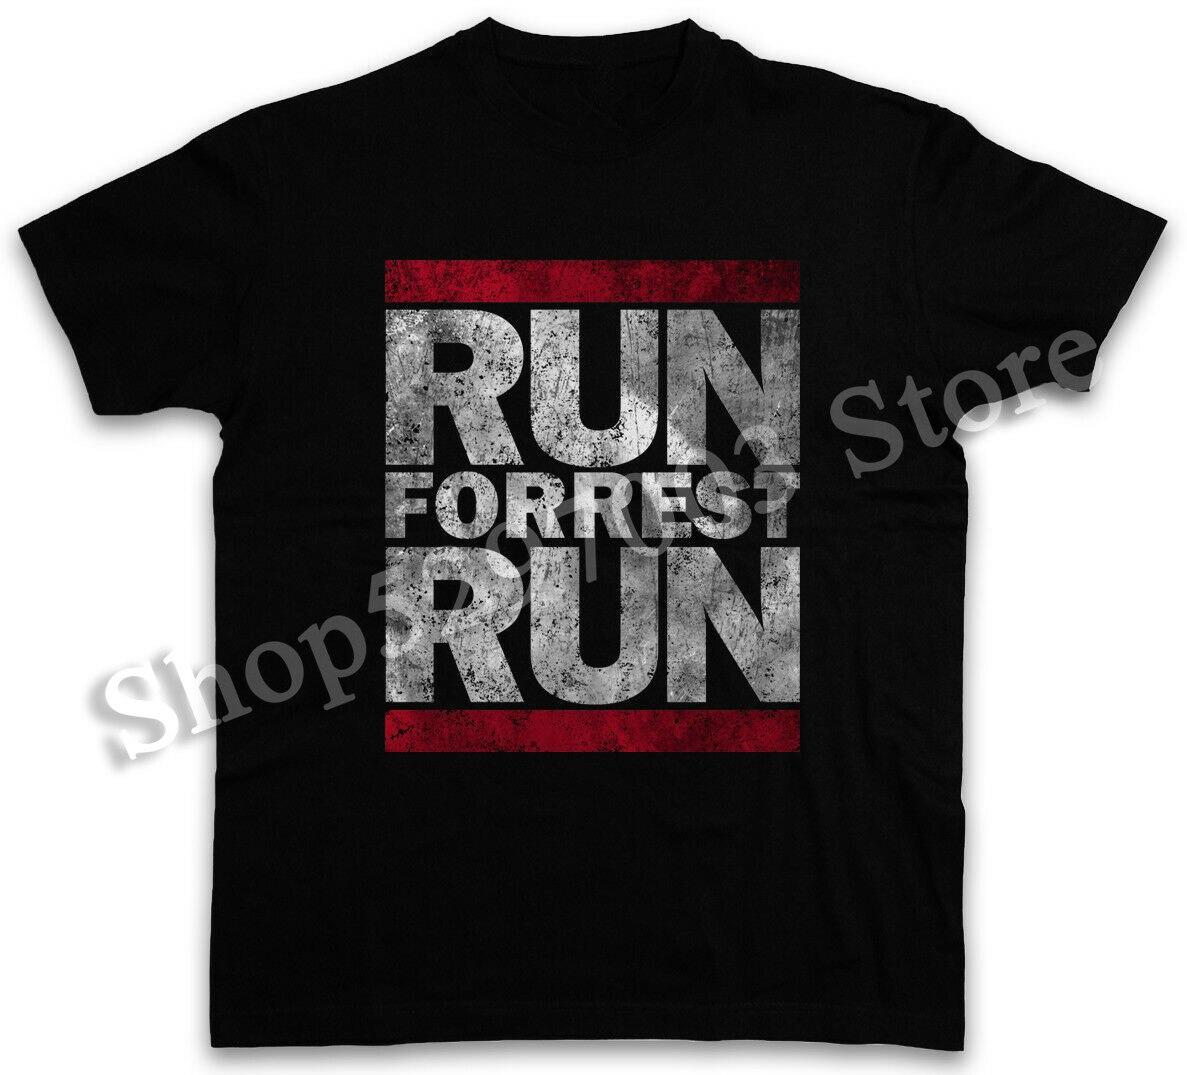 Camiseta de running Forrest Run, camiseta divertida Dmc Run Forrest Gump Run cita de película Harajuku divertida camiseta